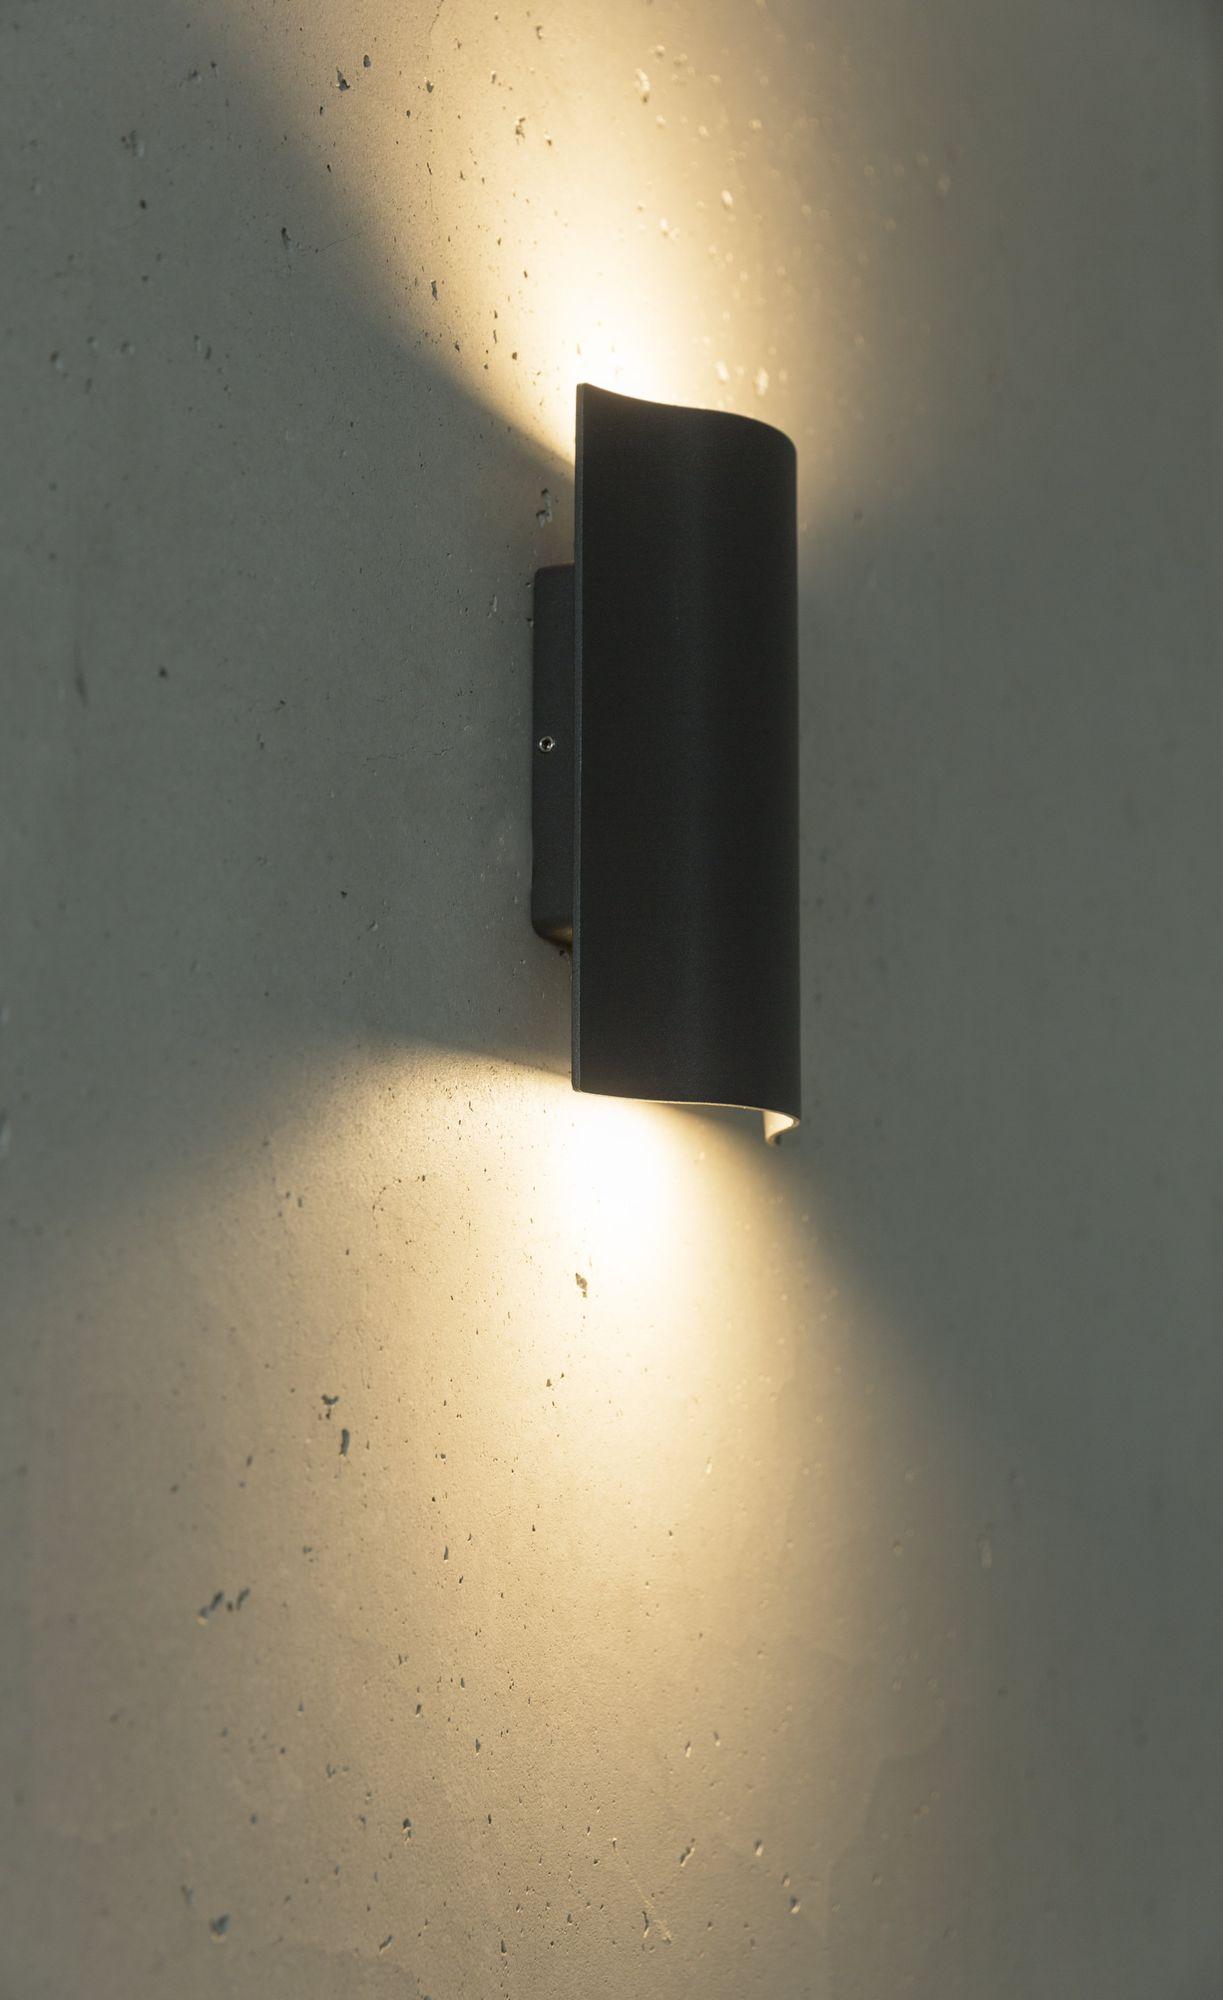 LED Wandleuchte Laola 11W 120x190mm Up-Down-Light IP54 dunkelgrau